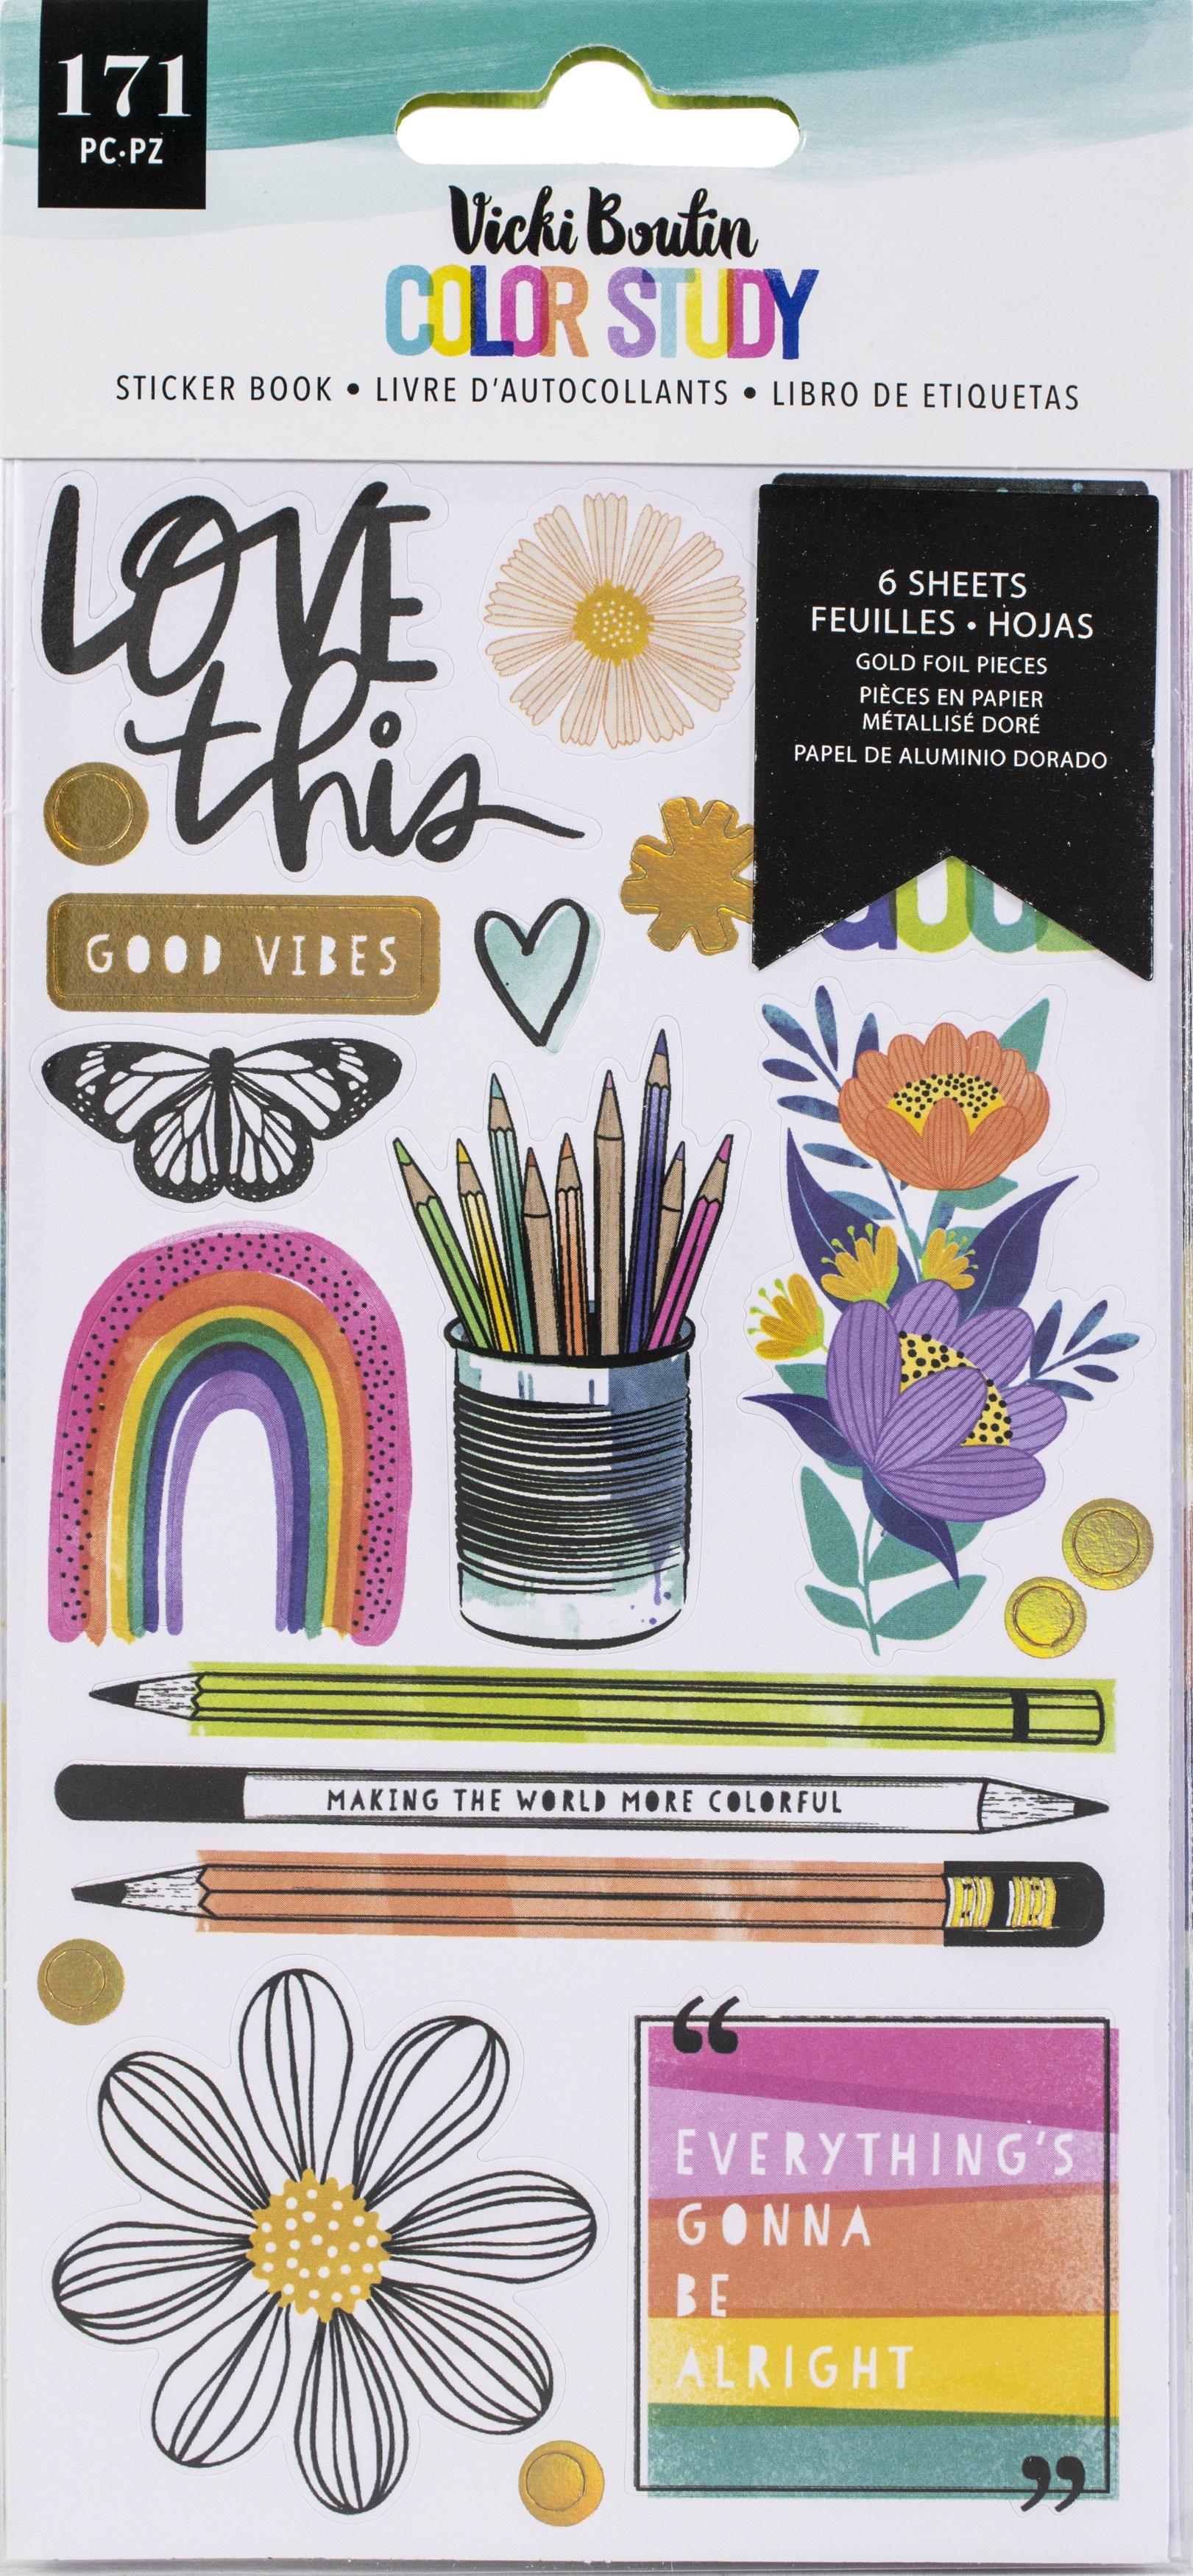 Vicki Boutin Color Study Sticker Book-W/Gold Foil Accents 171/Pkg